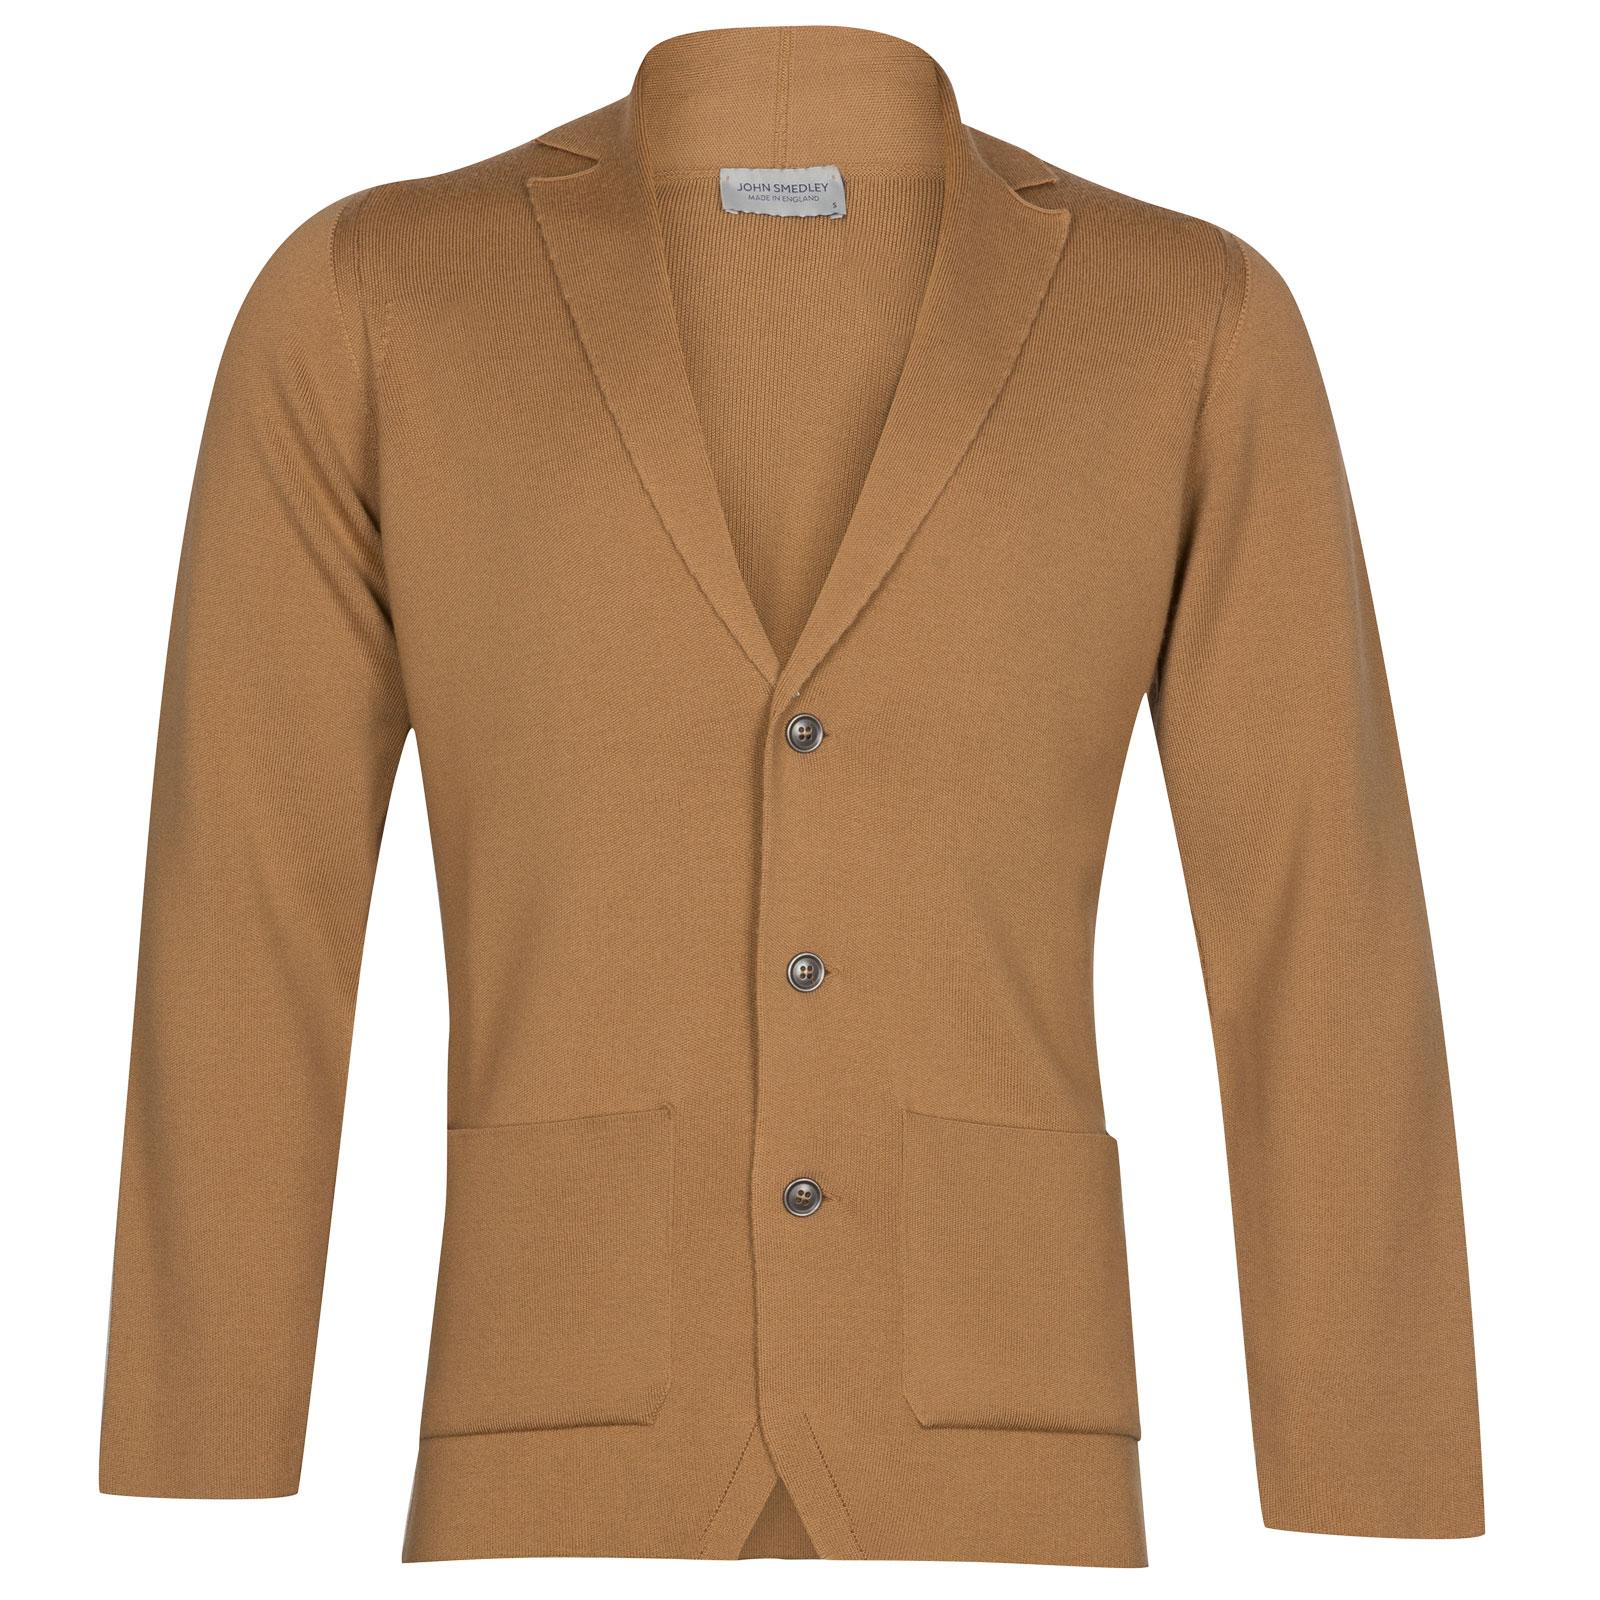 John Smedley Oxland Merino Wool Jacket in Camel-S